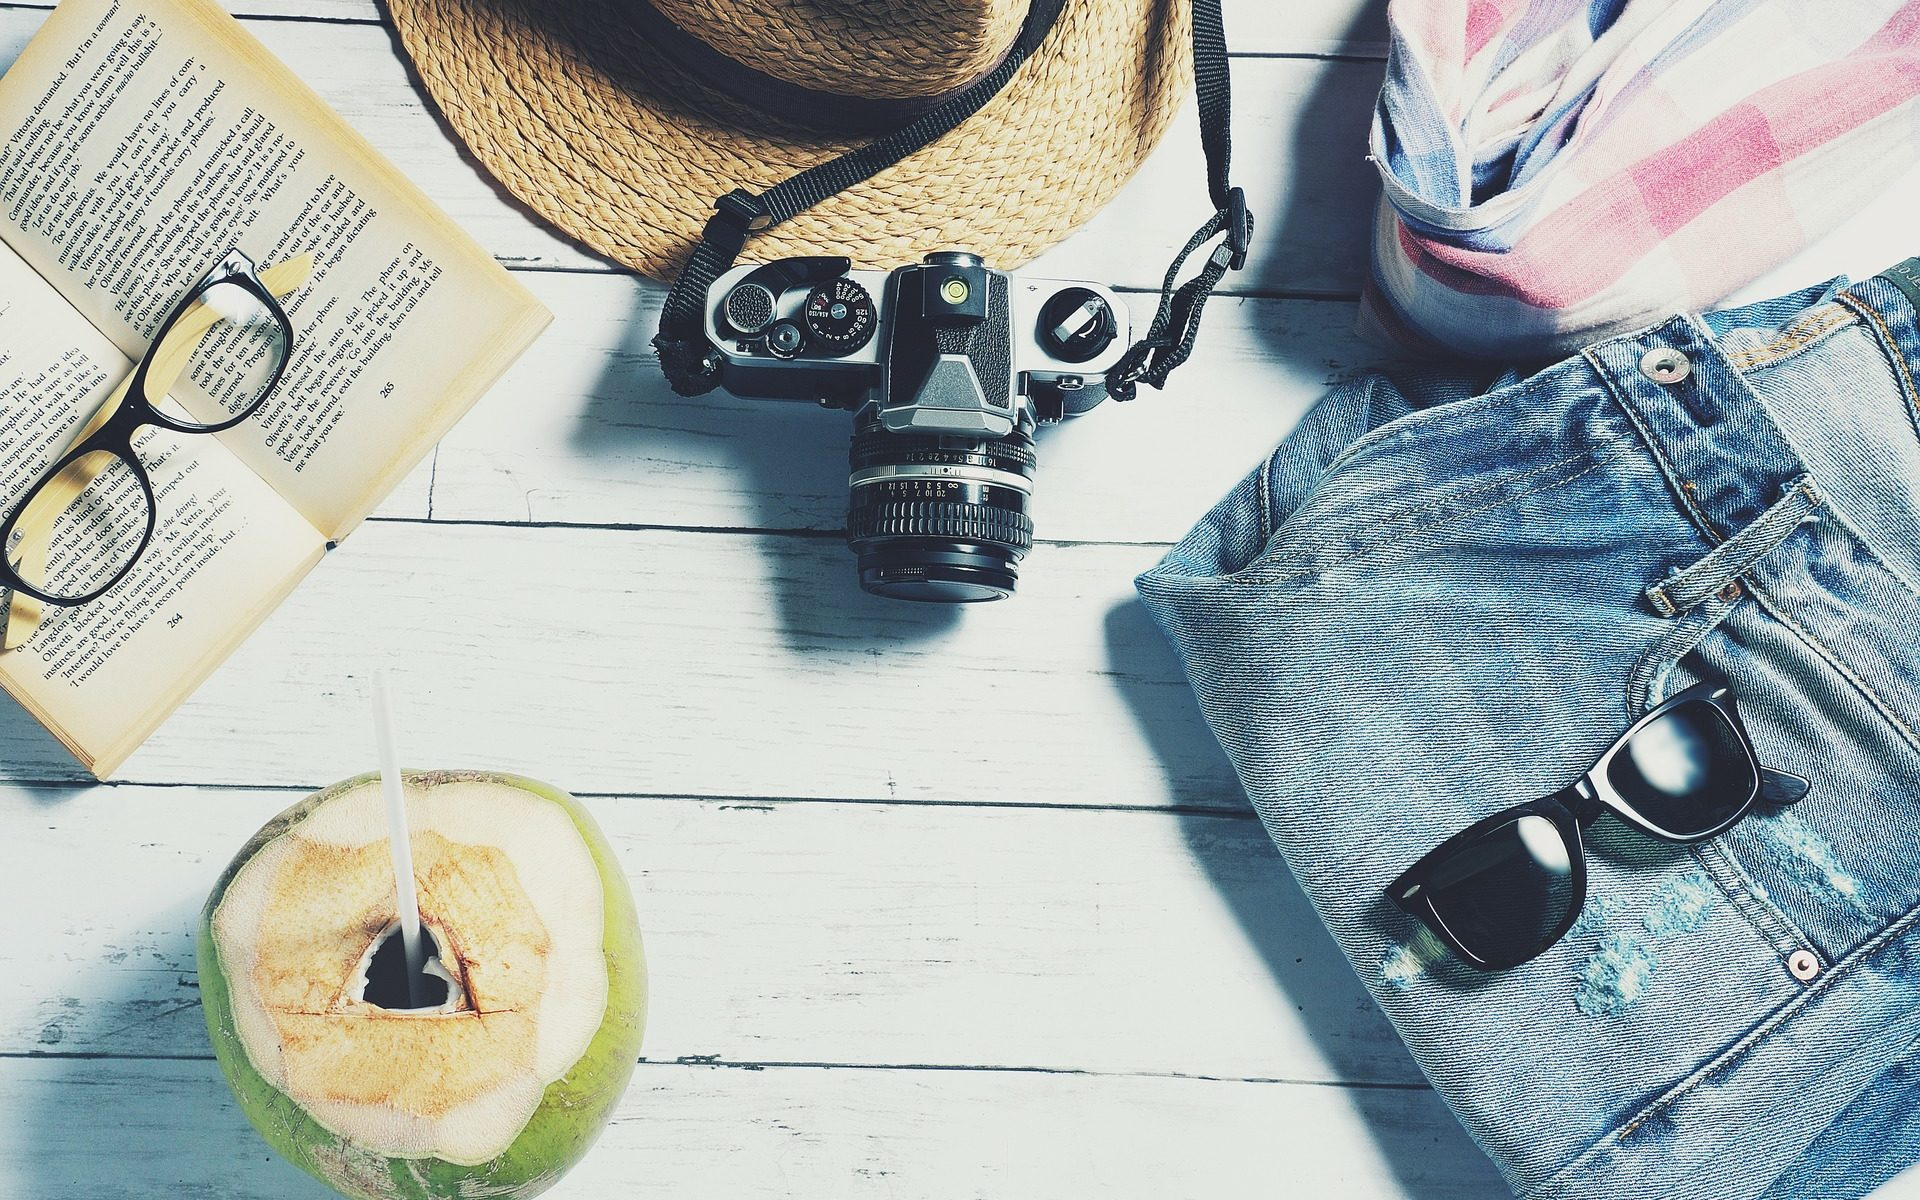 viaggiare con stile, come viaggiare con stile, viaggiare,